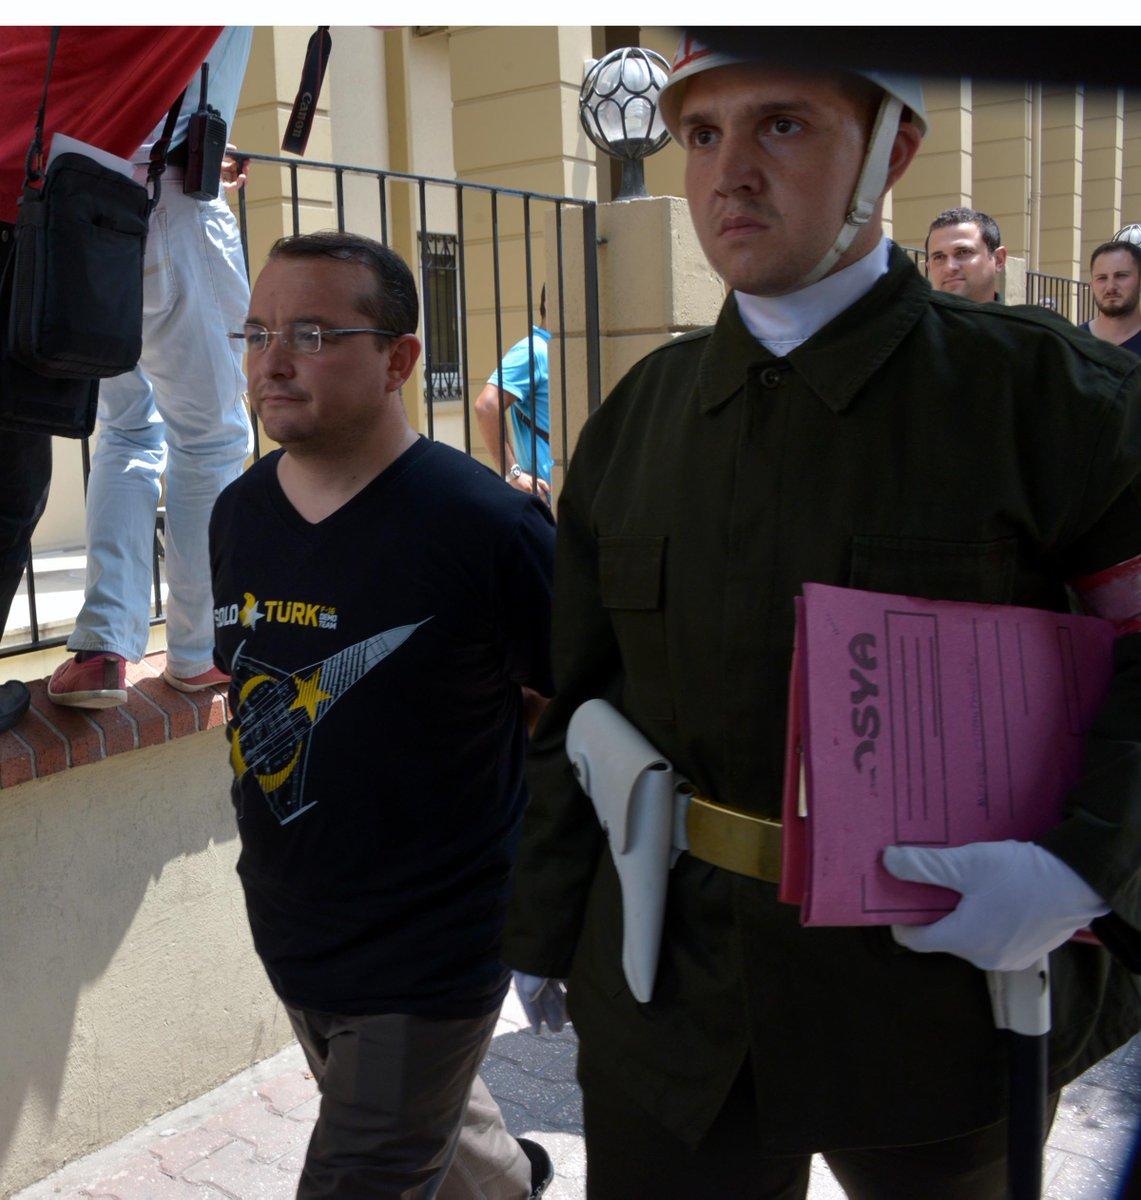 EKTAKTO: Συνελήφθη ο Διοικητής της ΝΑΤΟϊκής βάσης του Ιντσιρλίκ – Φήμες ότι αναζητούνται και Αμερικανοί στρατιώτες (εικόνες-βίντεο) - Εικόνα2